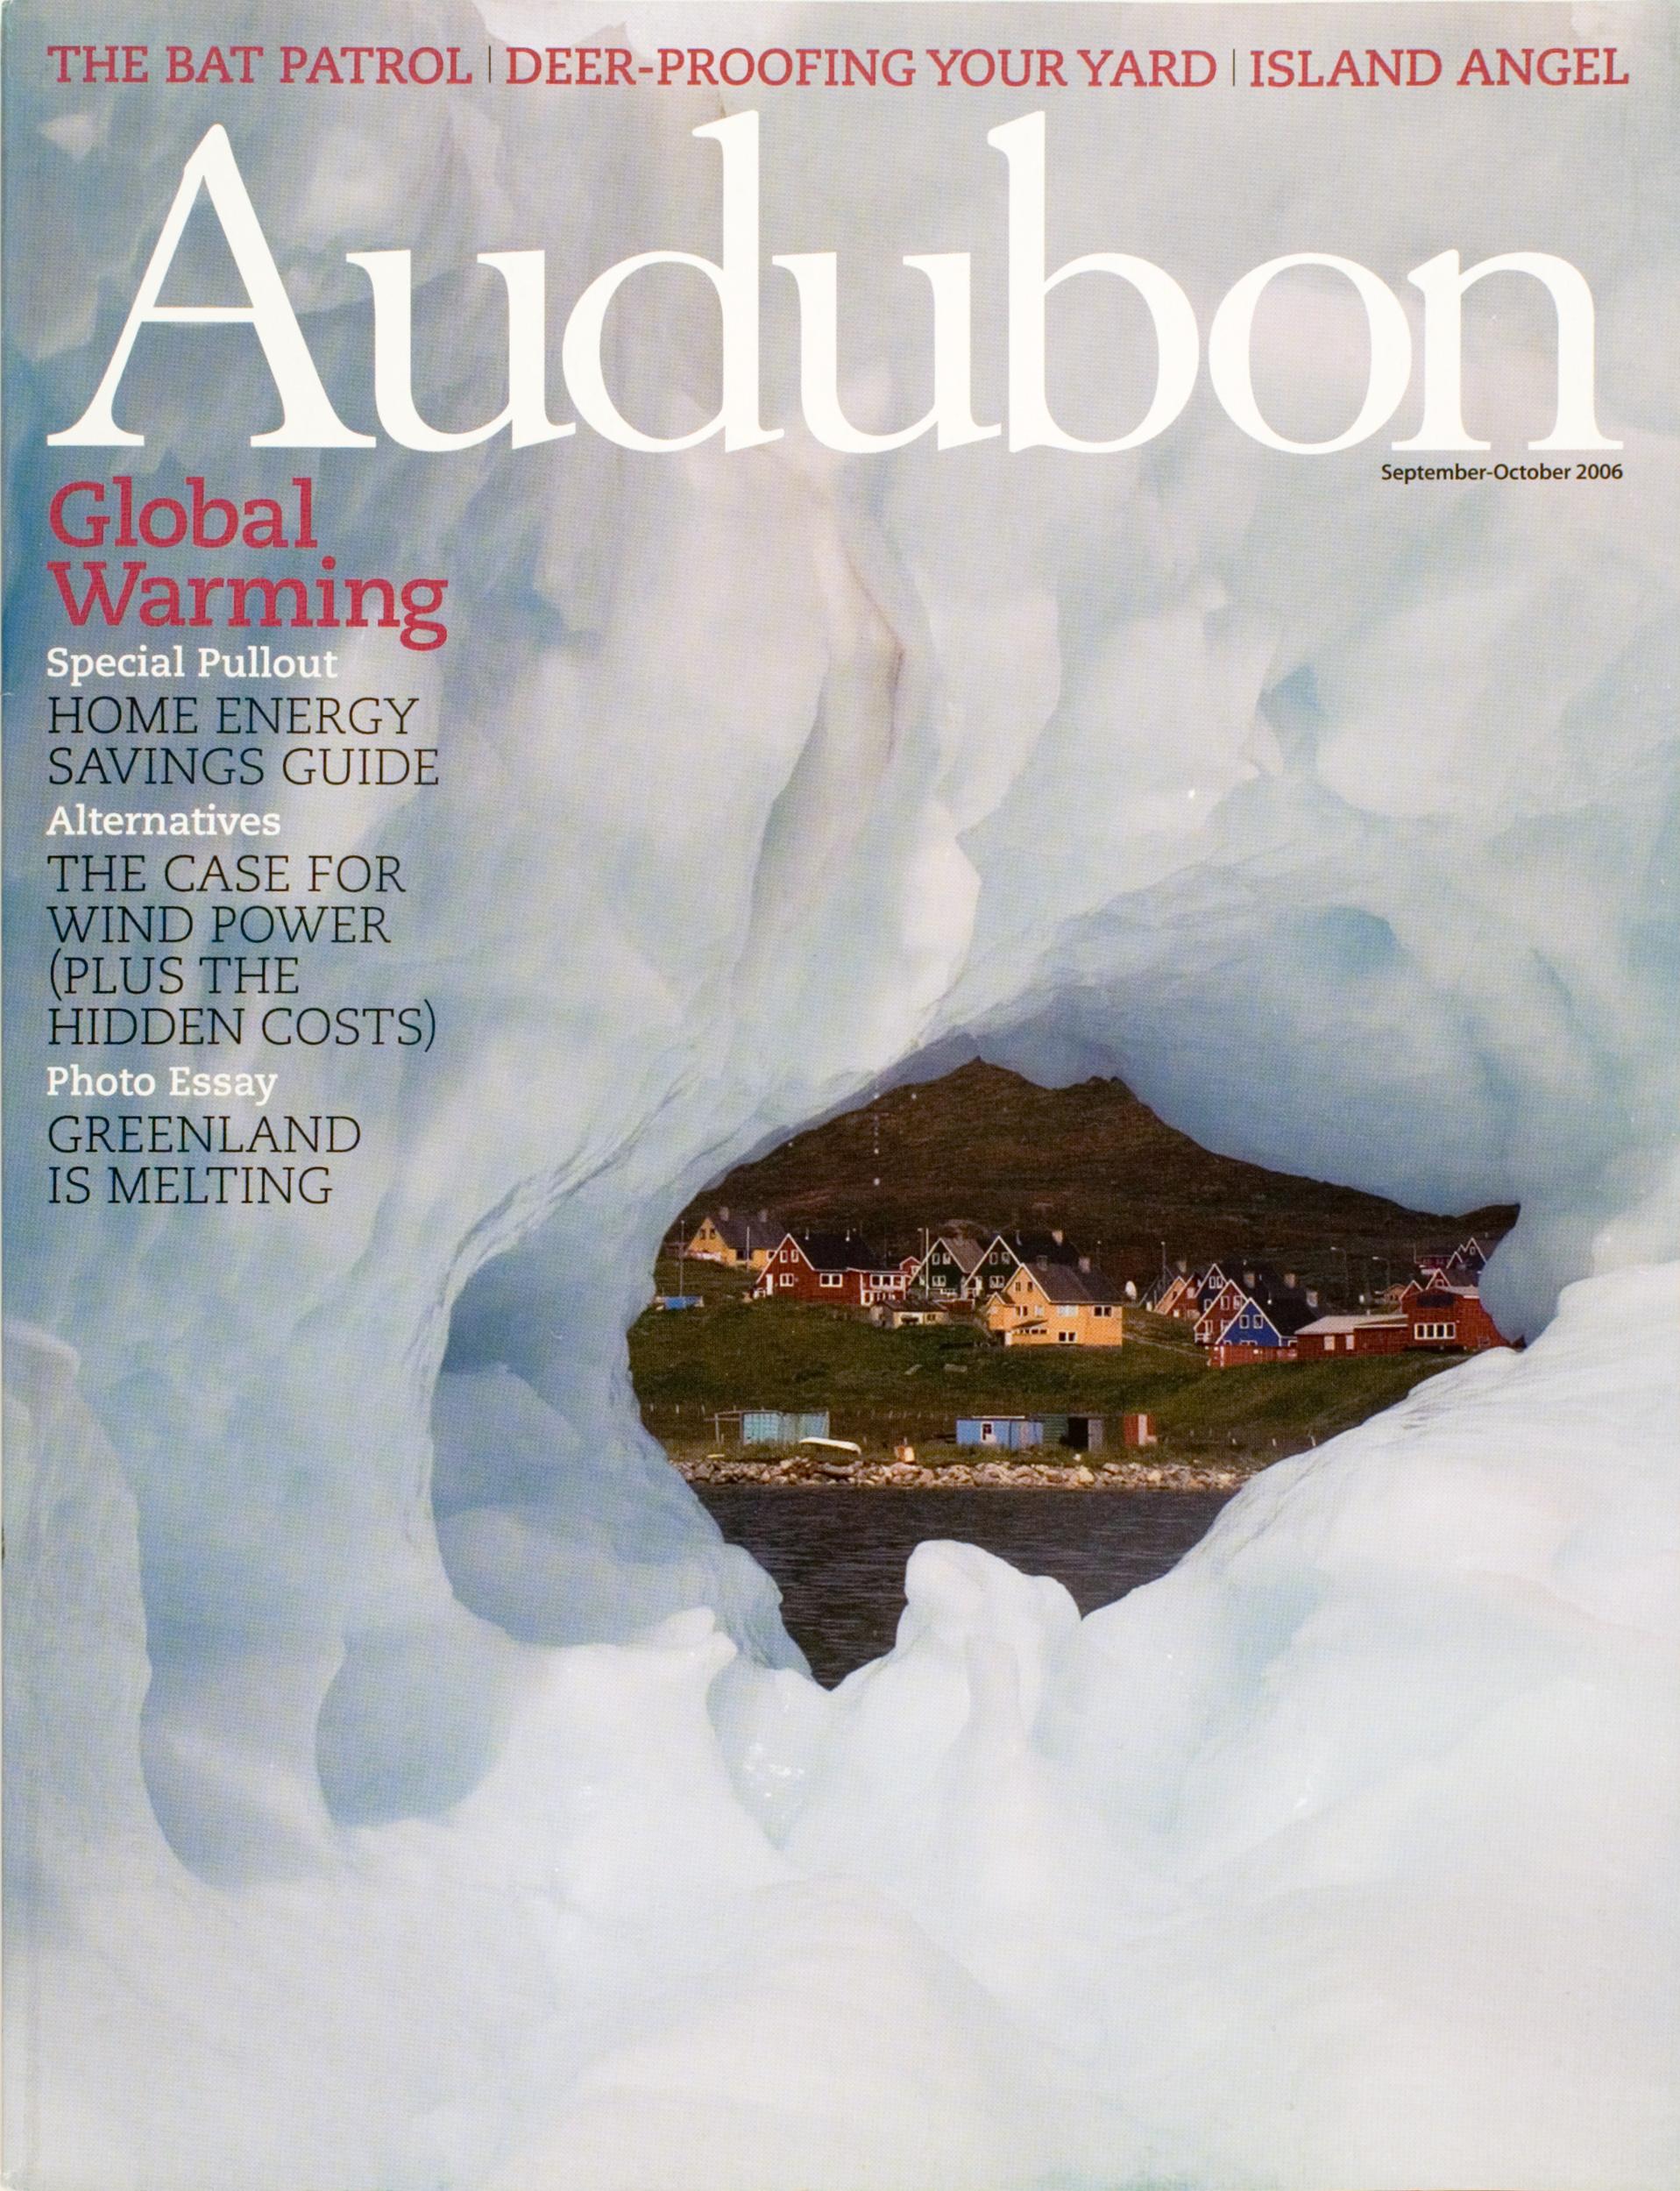 AudubonCover.jpg